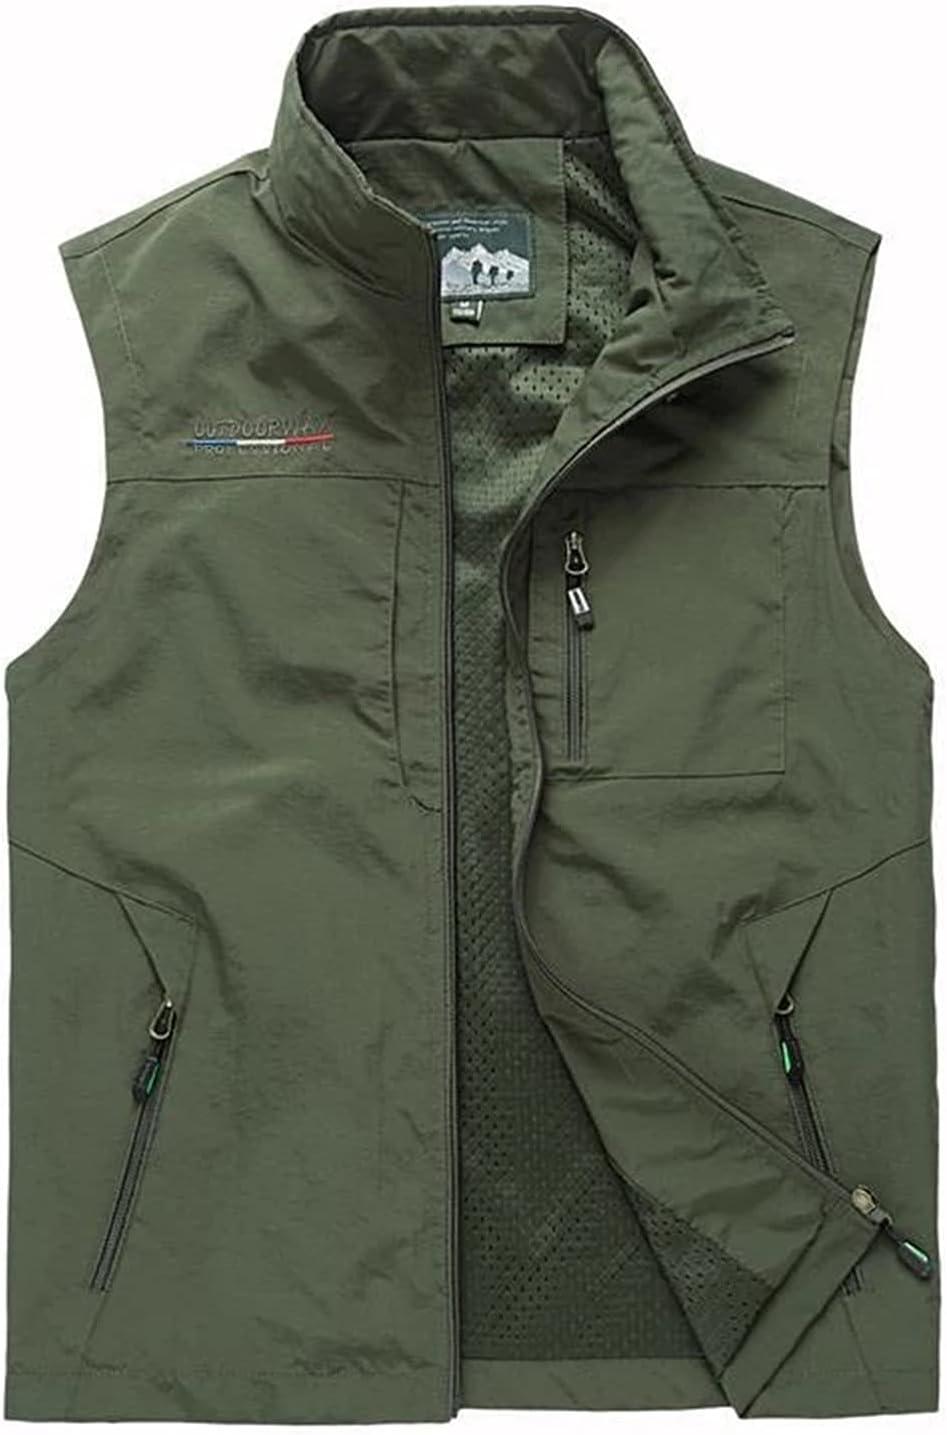 WFEI Men's Vest Summer Autumn Mesh Vest Many Pockets Men Outdoors Thin Classic Waistcoat Male Photographer Sleeveless Jacket,Green,XXL